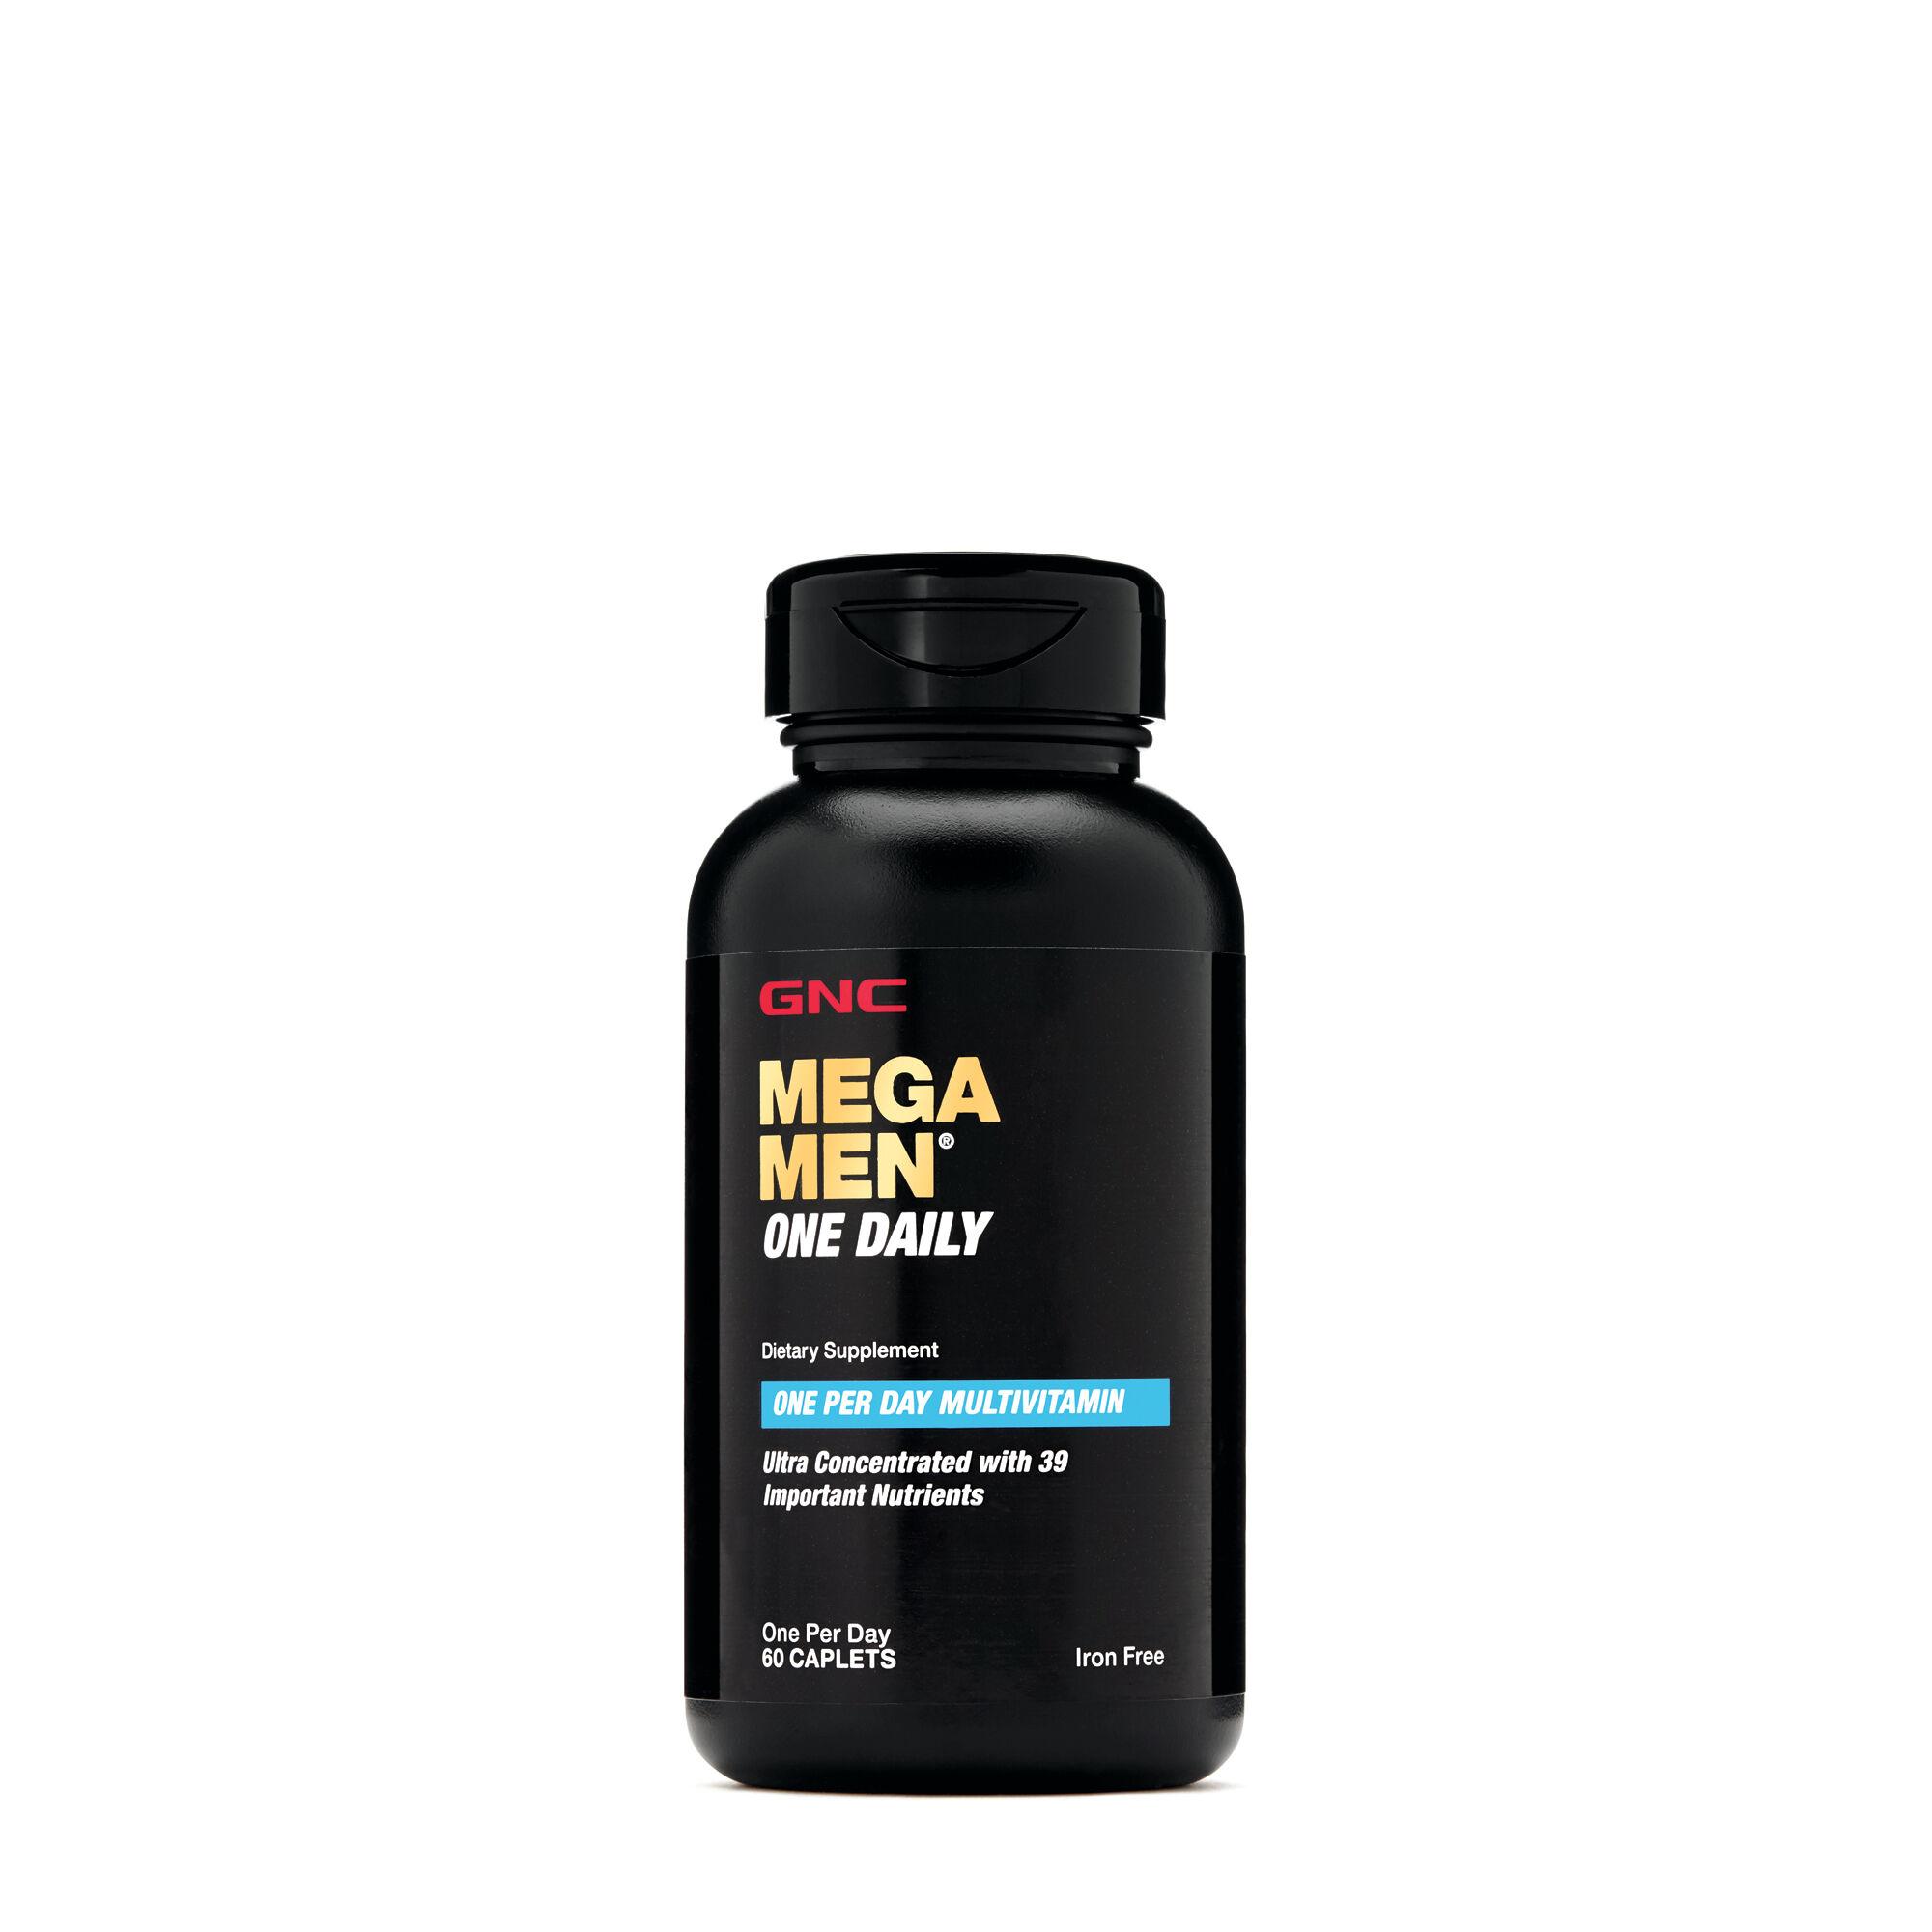 Mega Men� One Daily - 60 Caplets - GNC - Mega Men Multivitamins